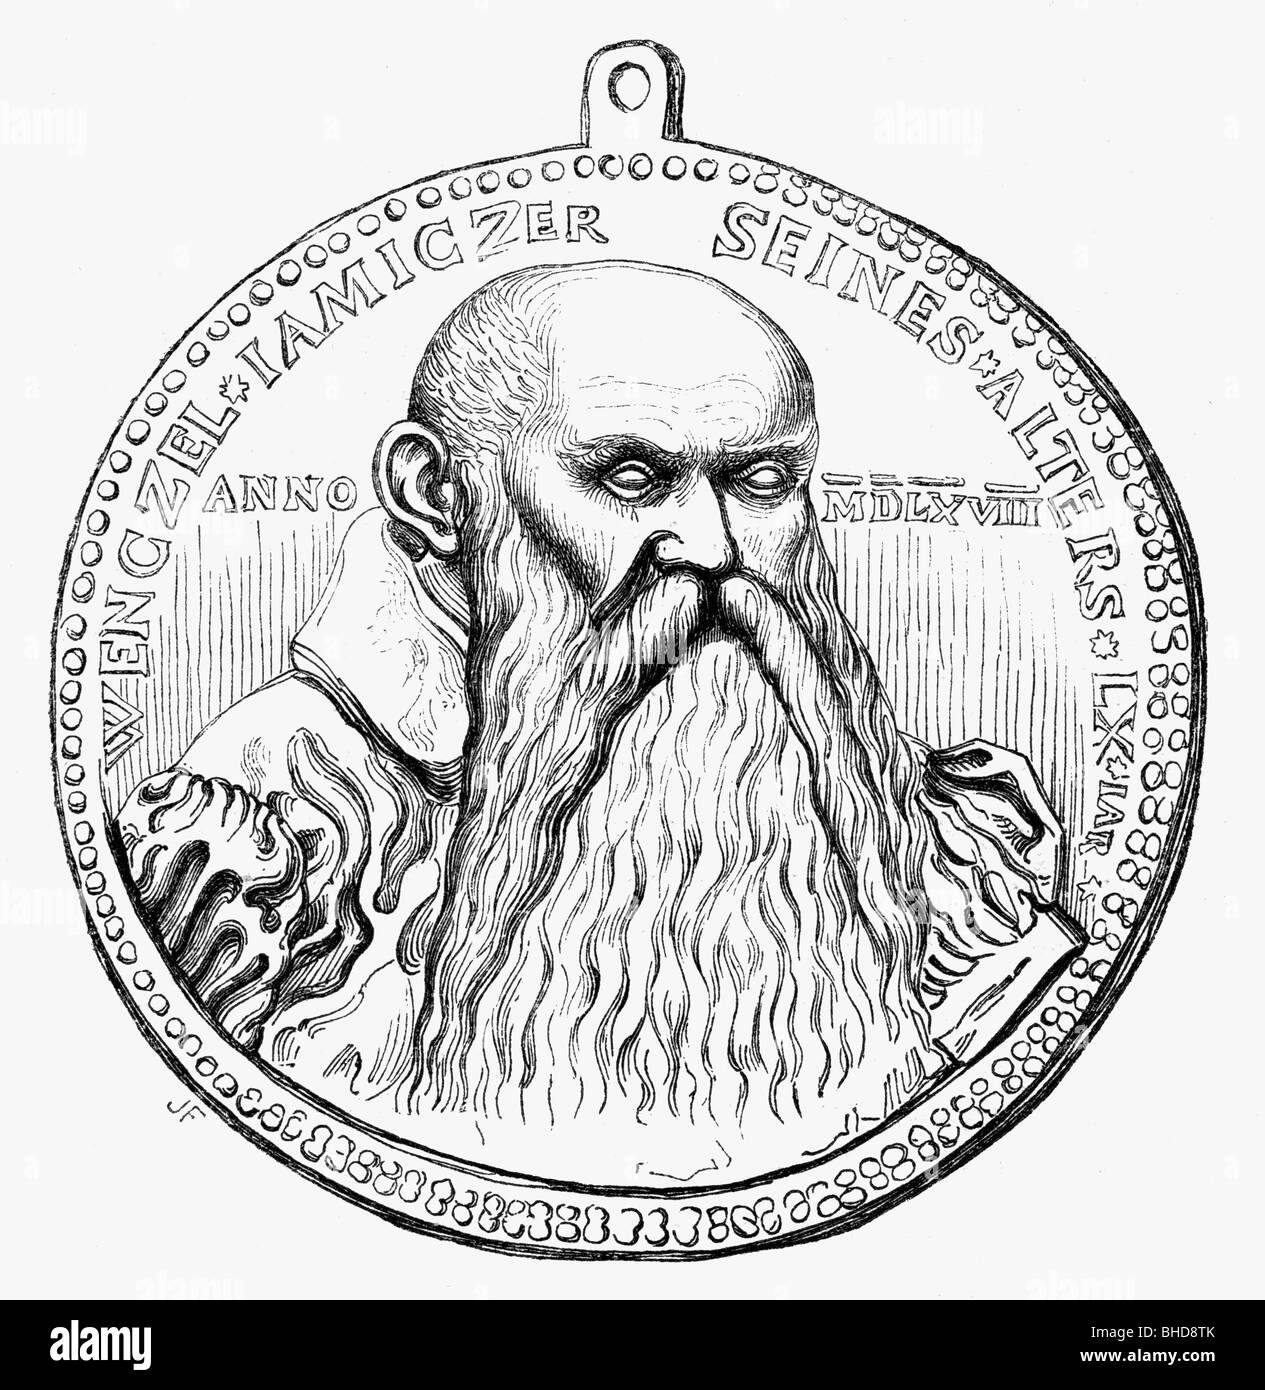 Jamitzer, Wenzel (Jamnitzer), 1508 - 19.12.1585, German printmaker, goldsmith, mathematician, portrait, wood engraving - Stock Image